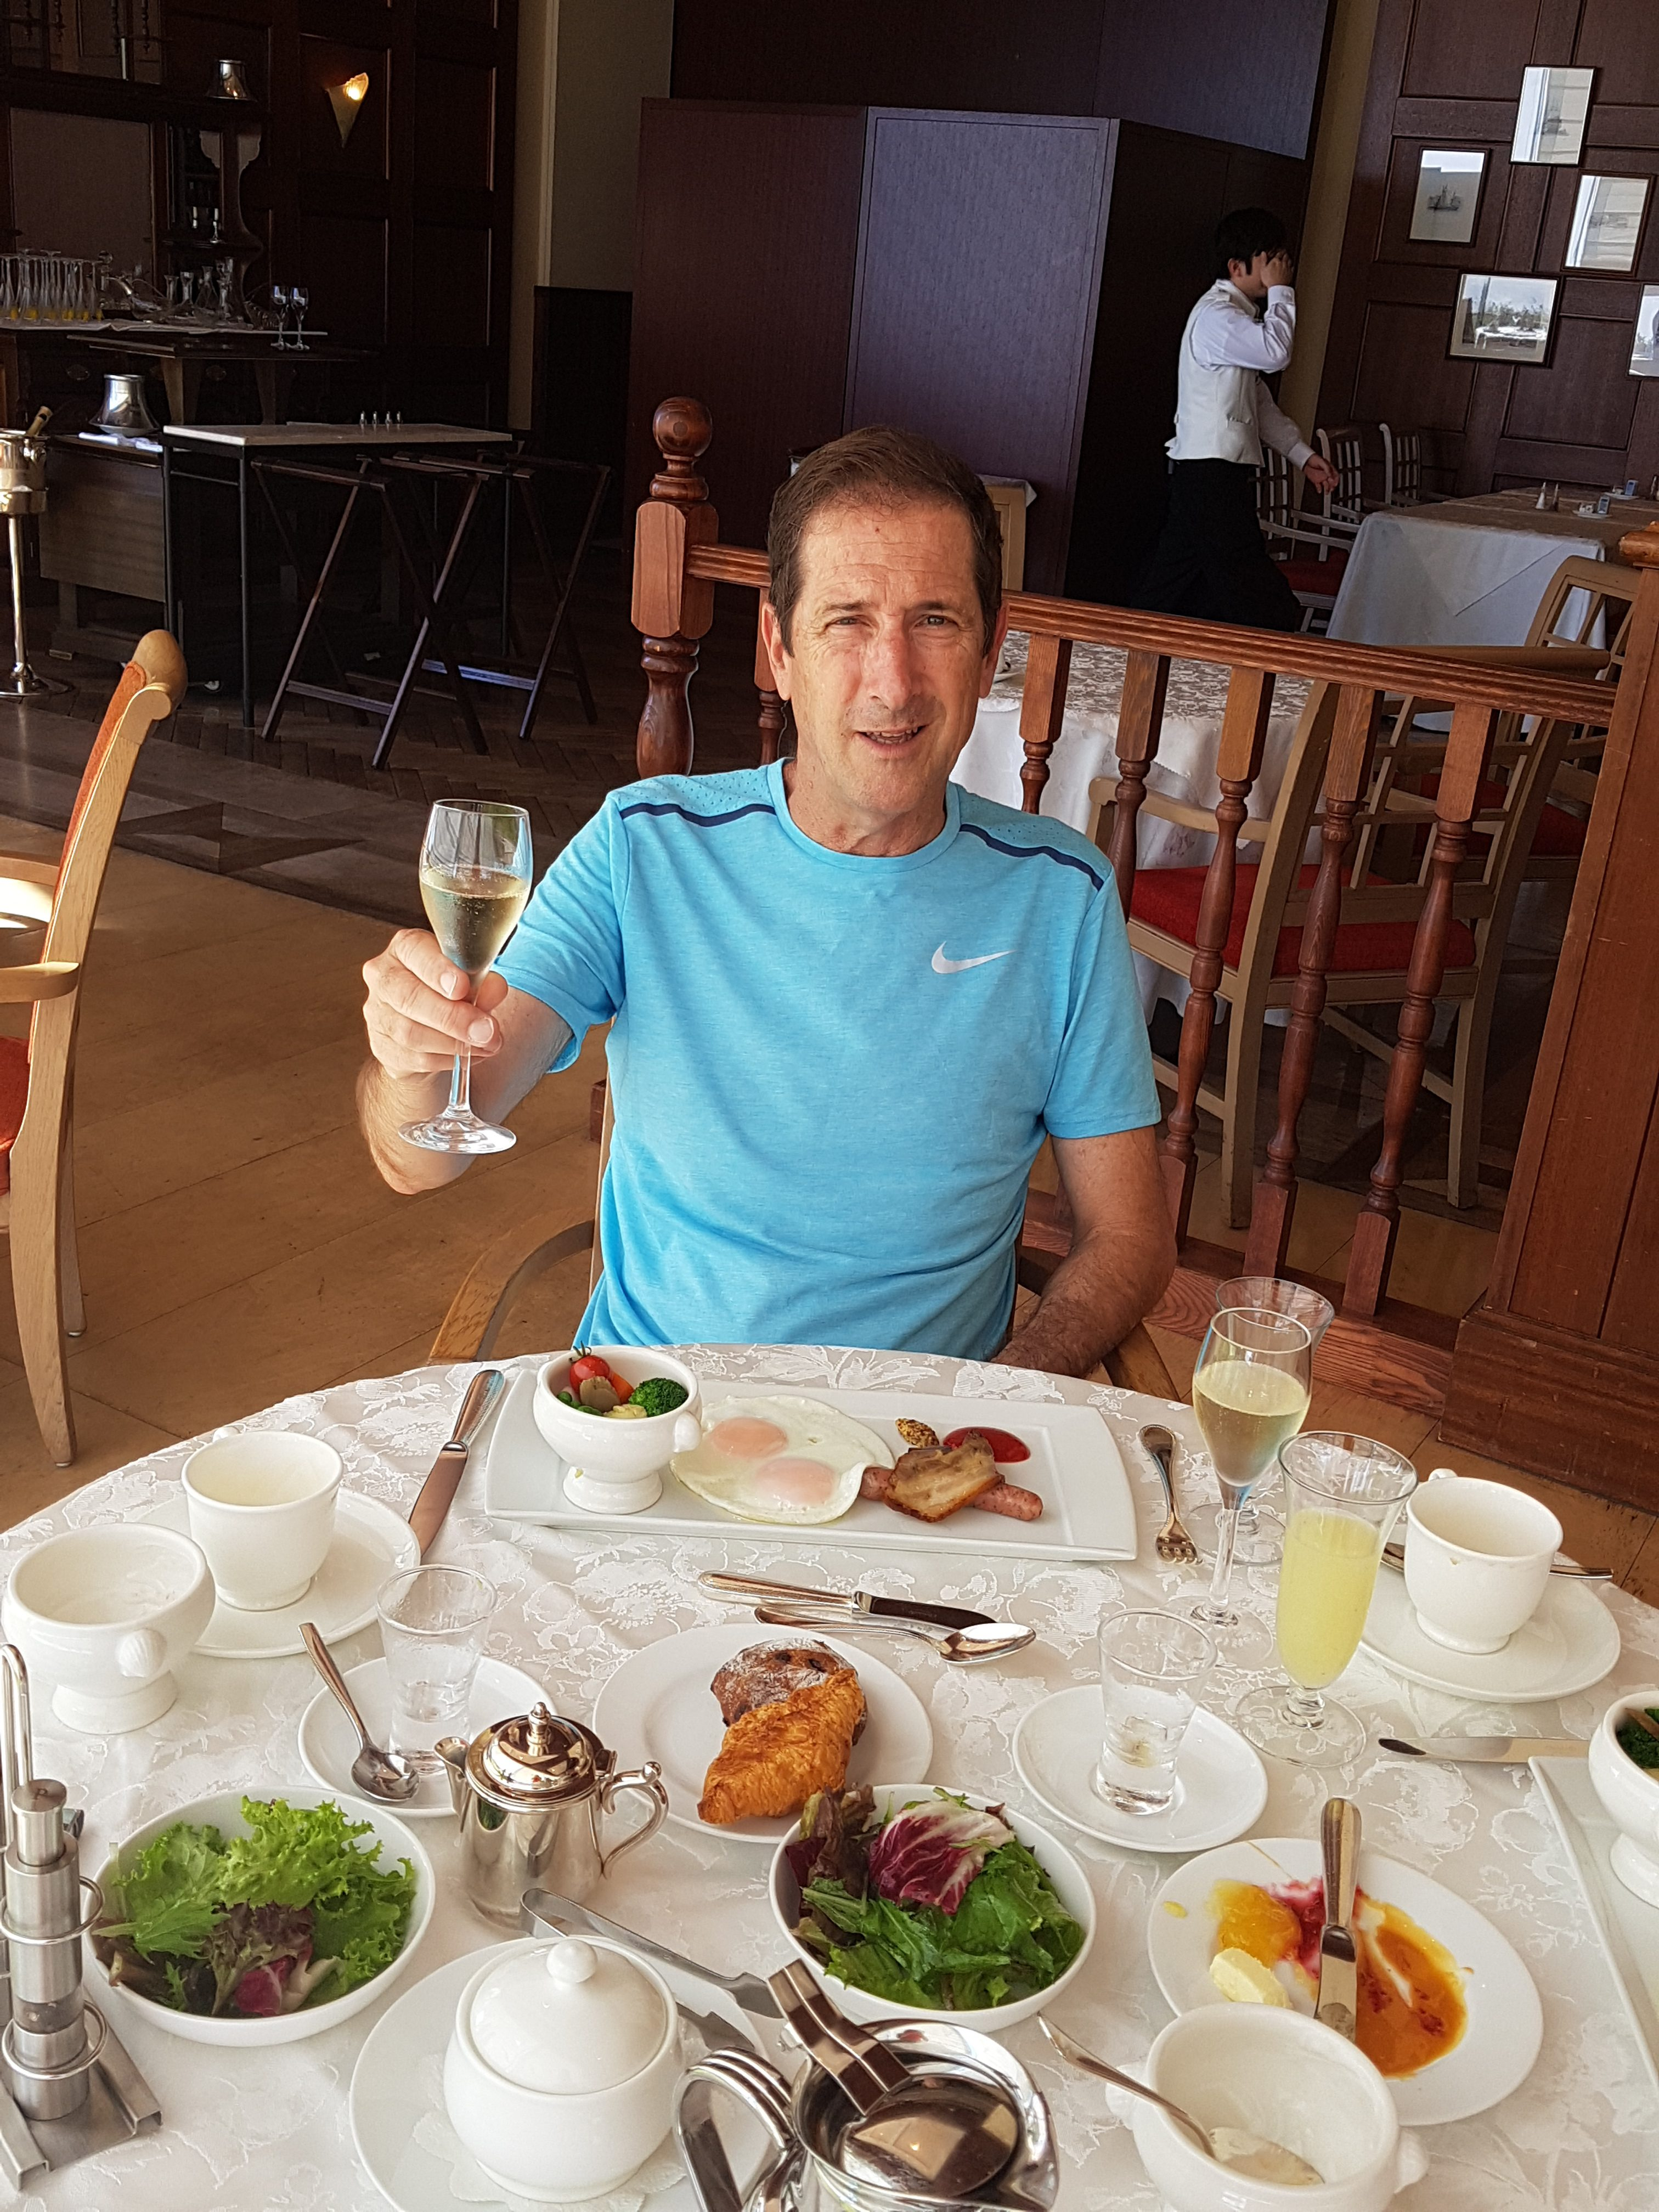 Breakfast at Windsor hotel